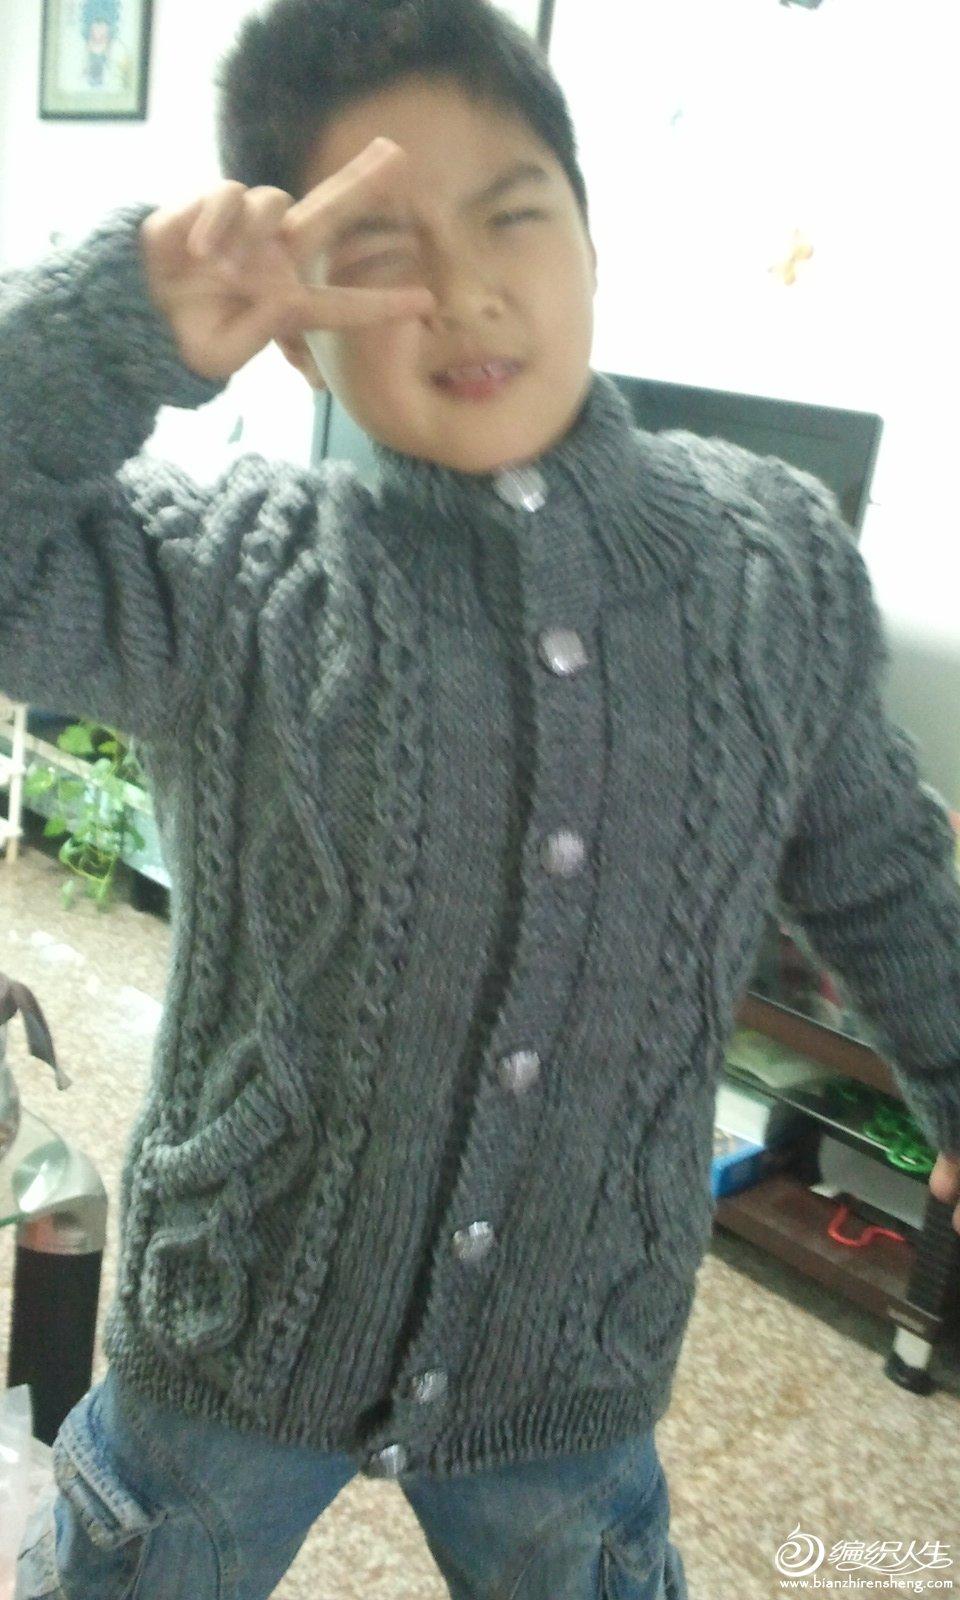 C360_2012-12-01-10-25-44.jpg